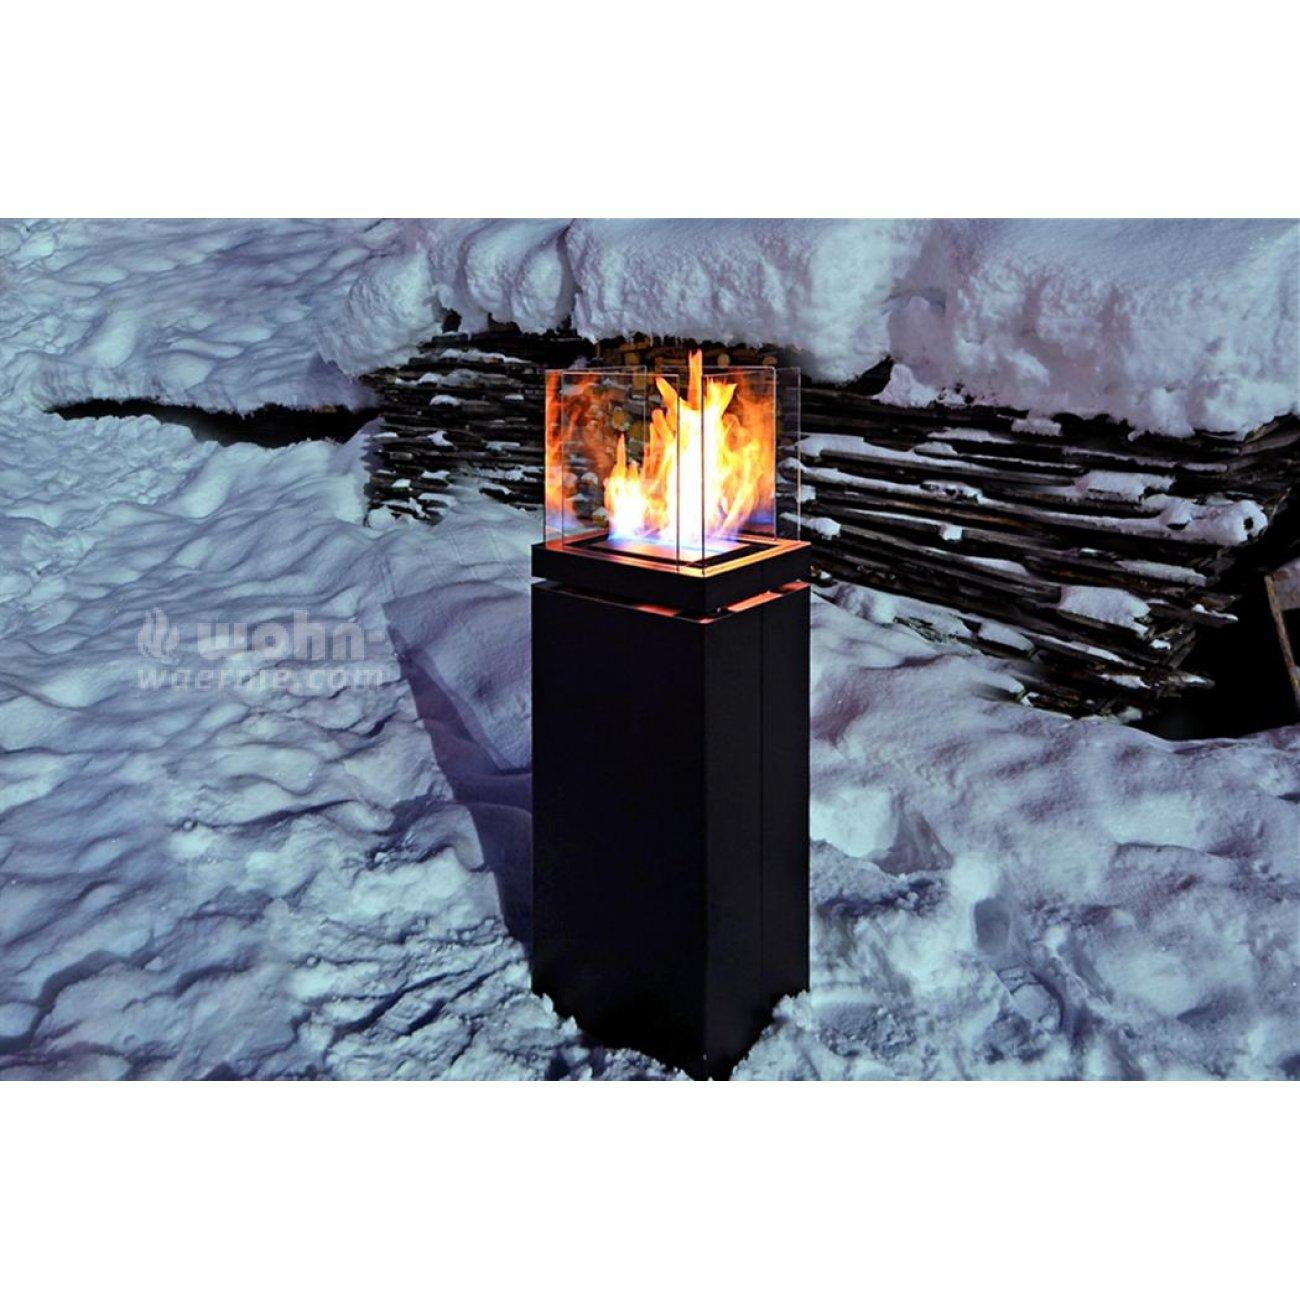 stand ethanolkamin radius design high flame. Black Bedroom Furniture Sets. Home Design Ideas